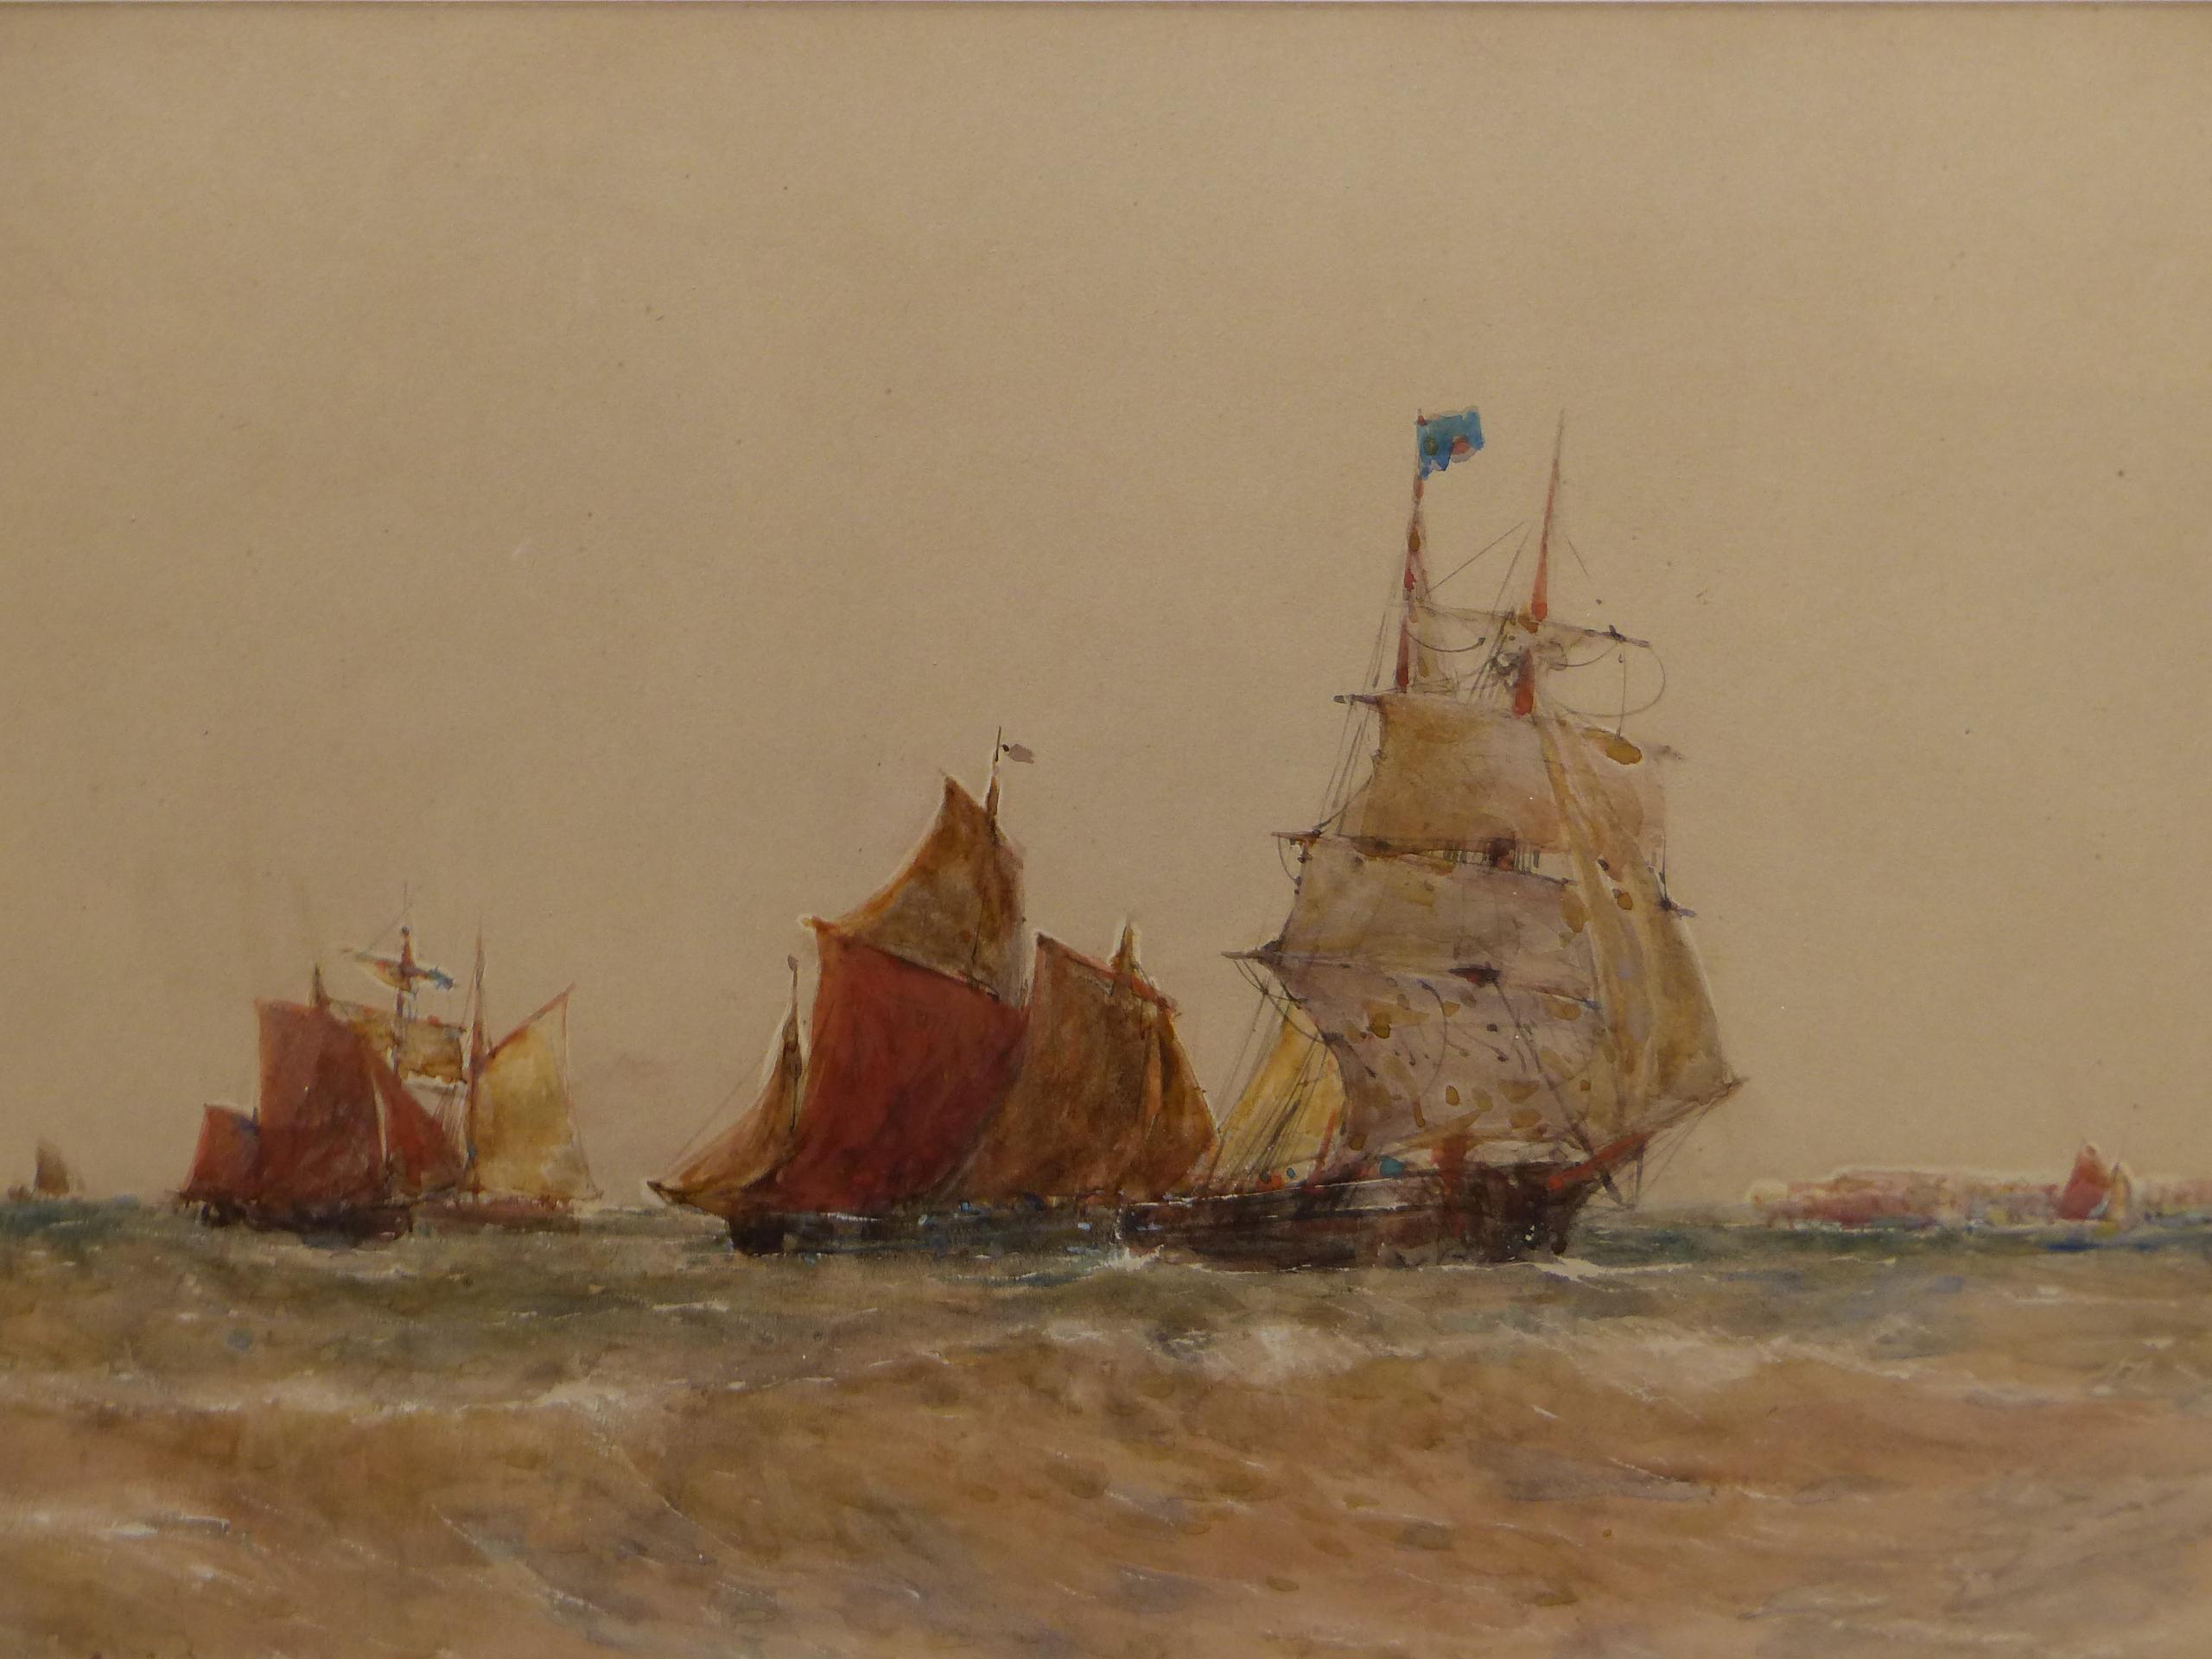 THOMAS BUSH HARDY (1842 - 1897). SHIPPING OFF CALAIS, SIGNED WATERCOLOUR, 40 x 68cms.